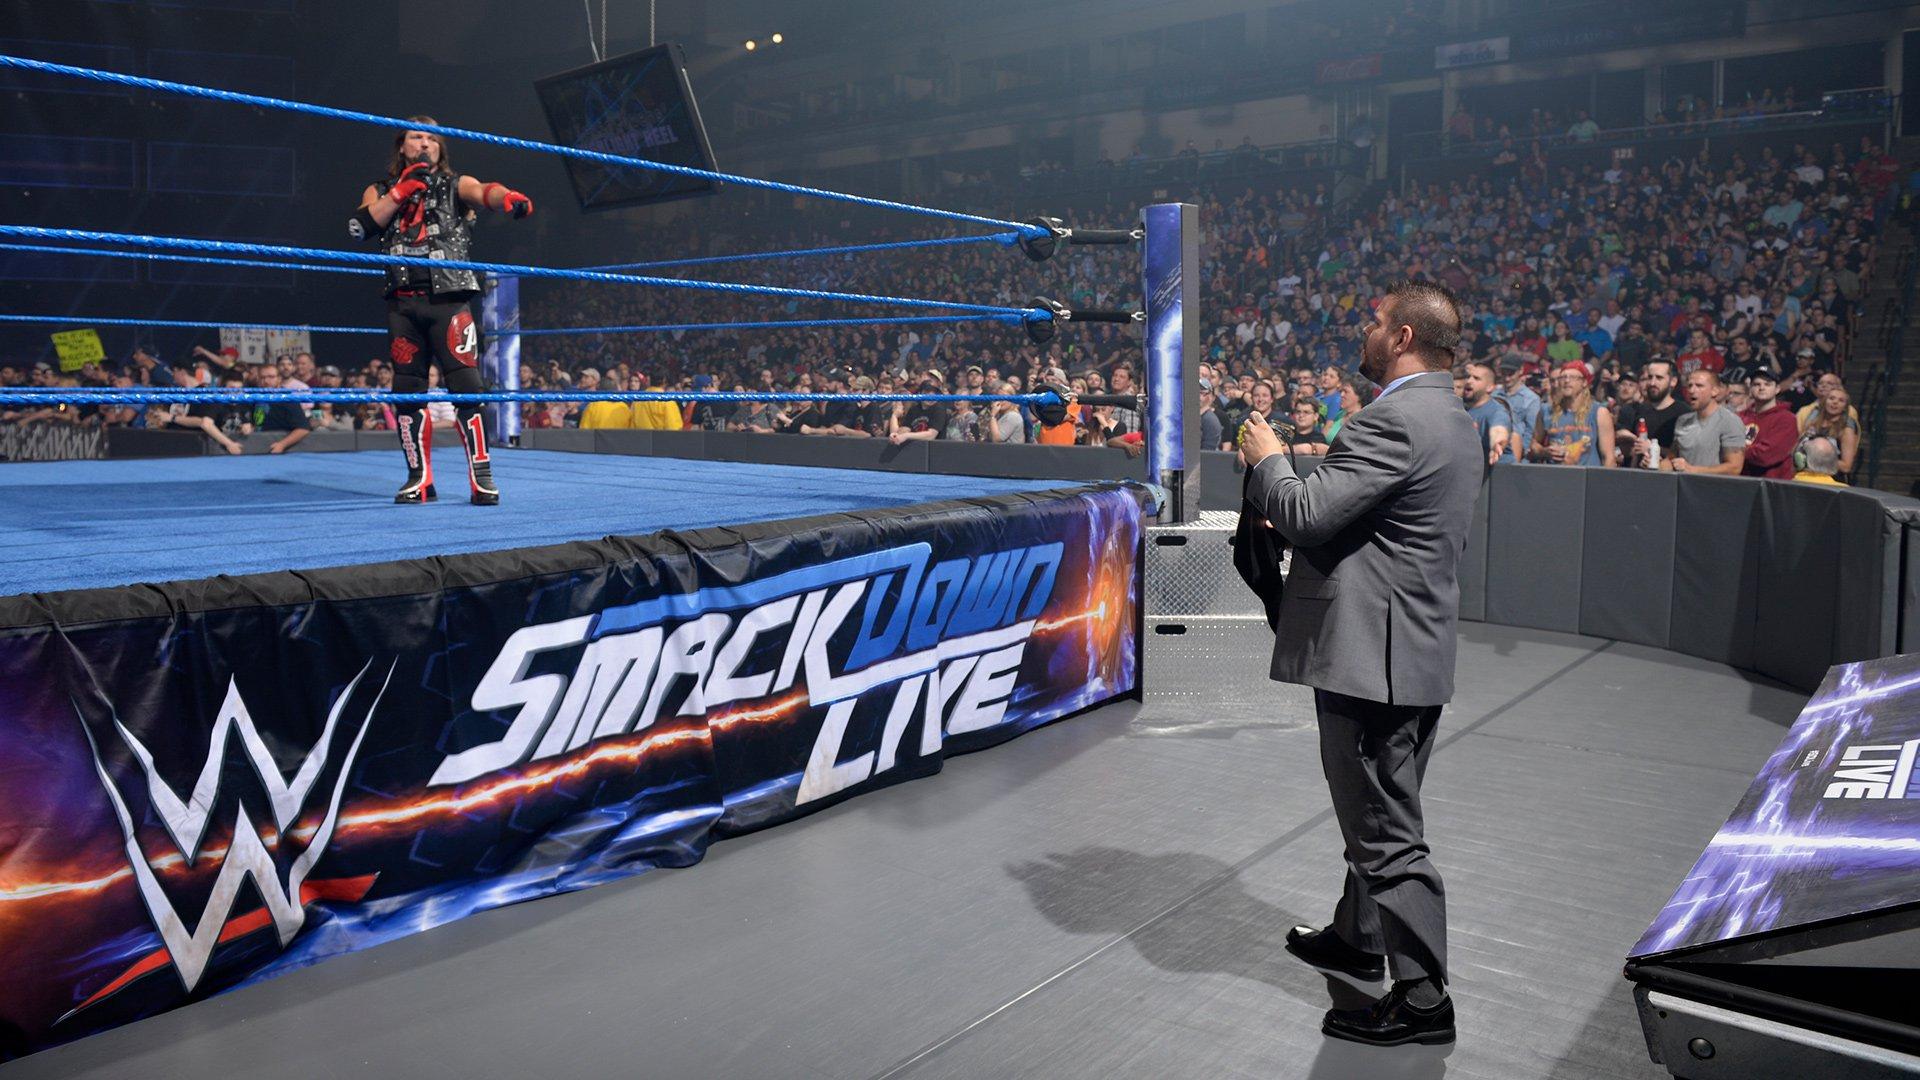 Kevin Owens' Highlight Reel raises tensions between AJ Styles and Jinder Mahal: photos